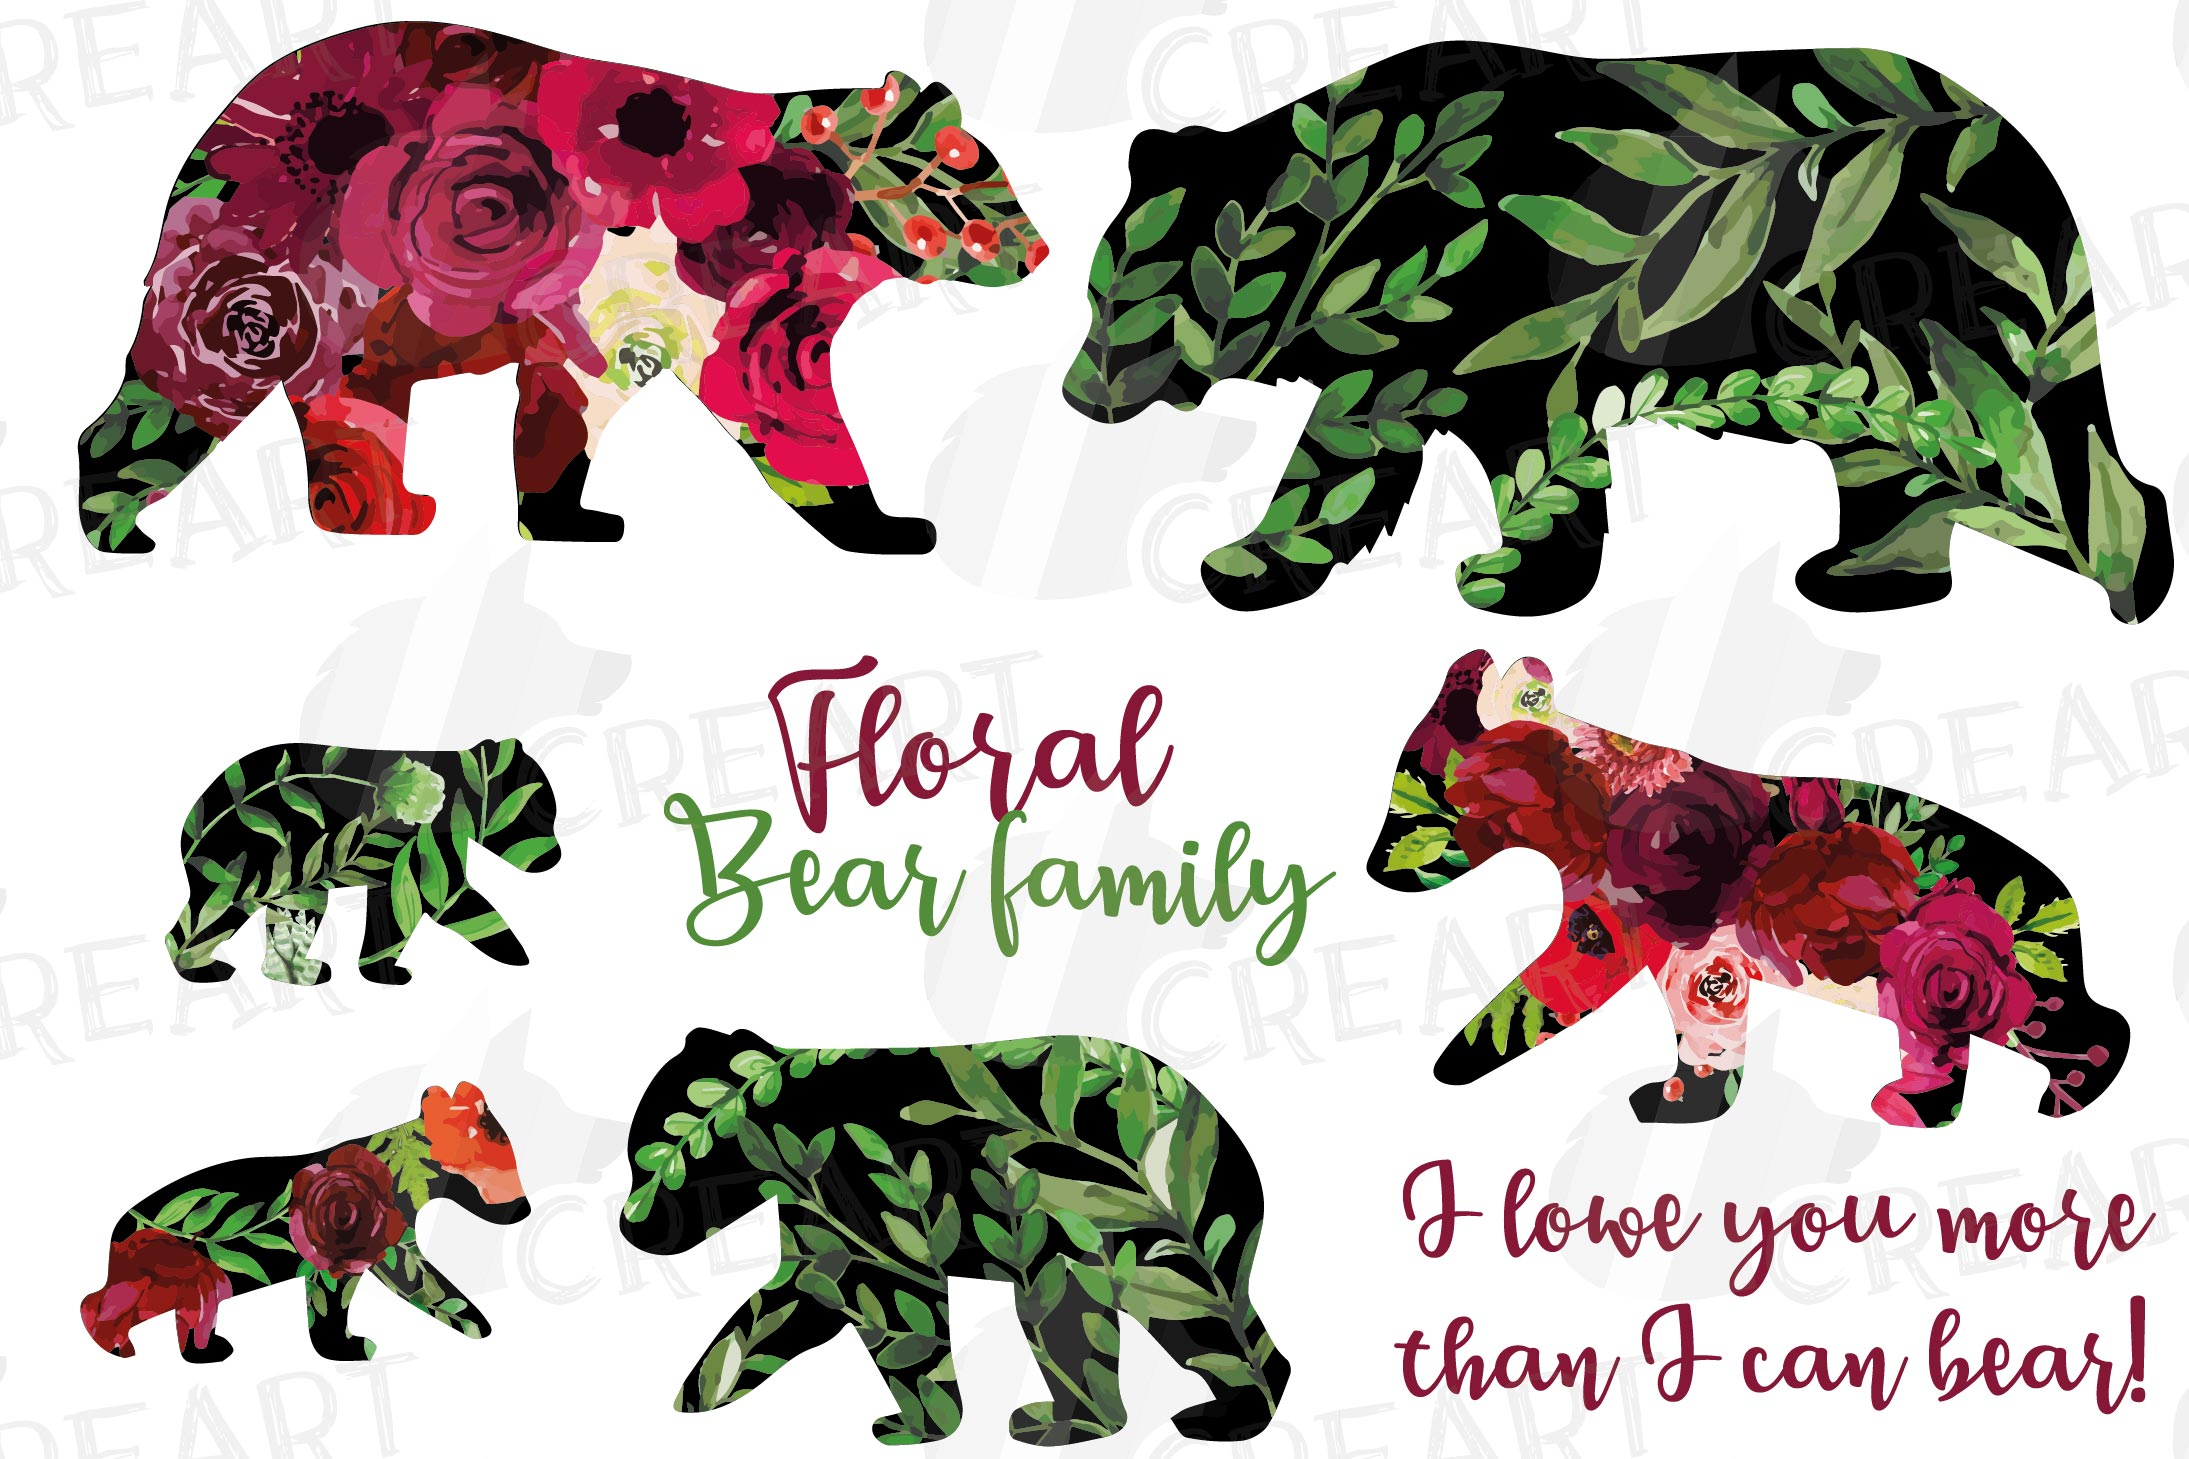 Floral bear family, sister, brother, baby, papa, mama bear example image 2